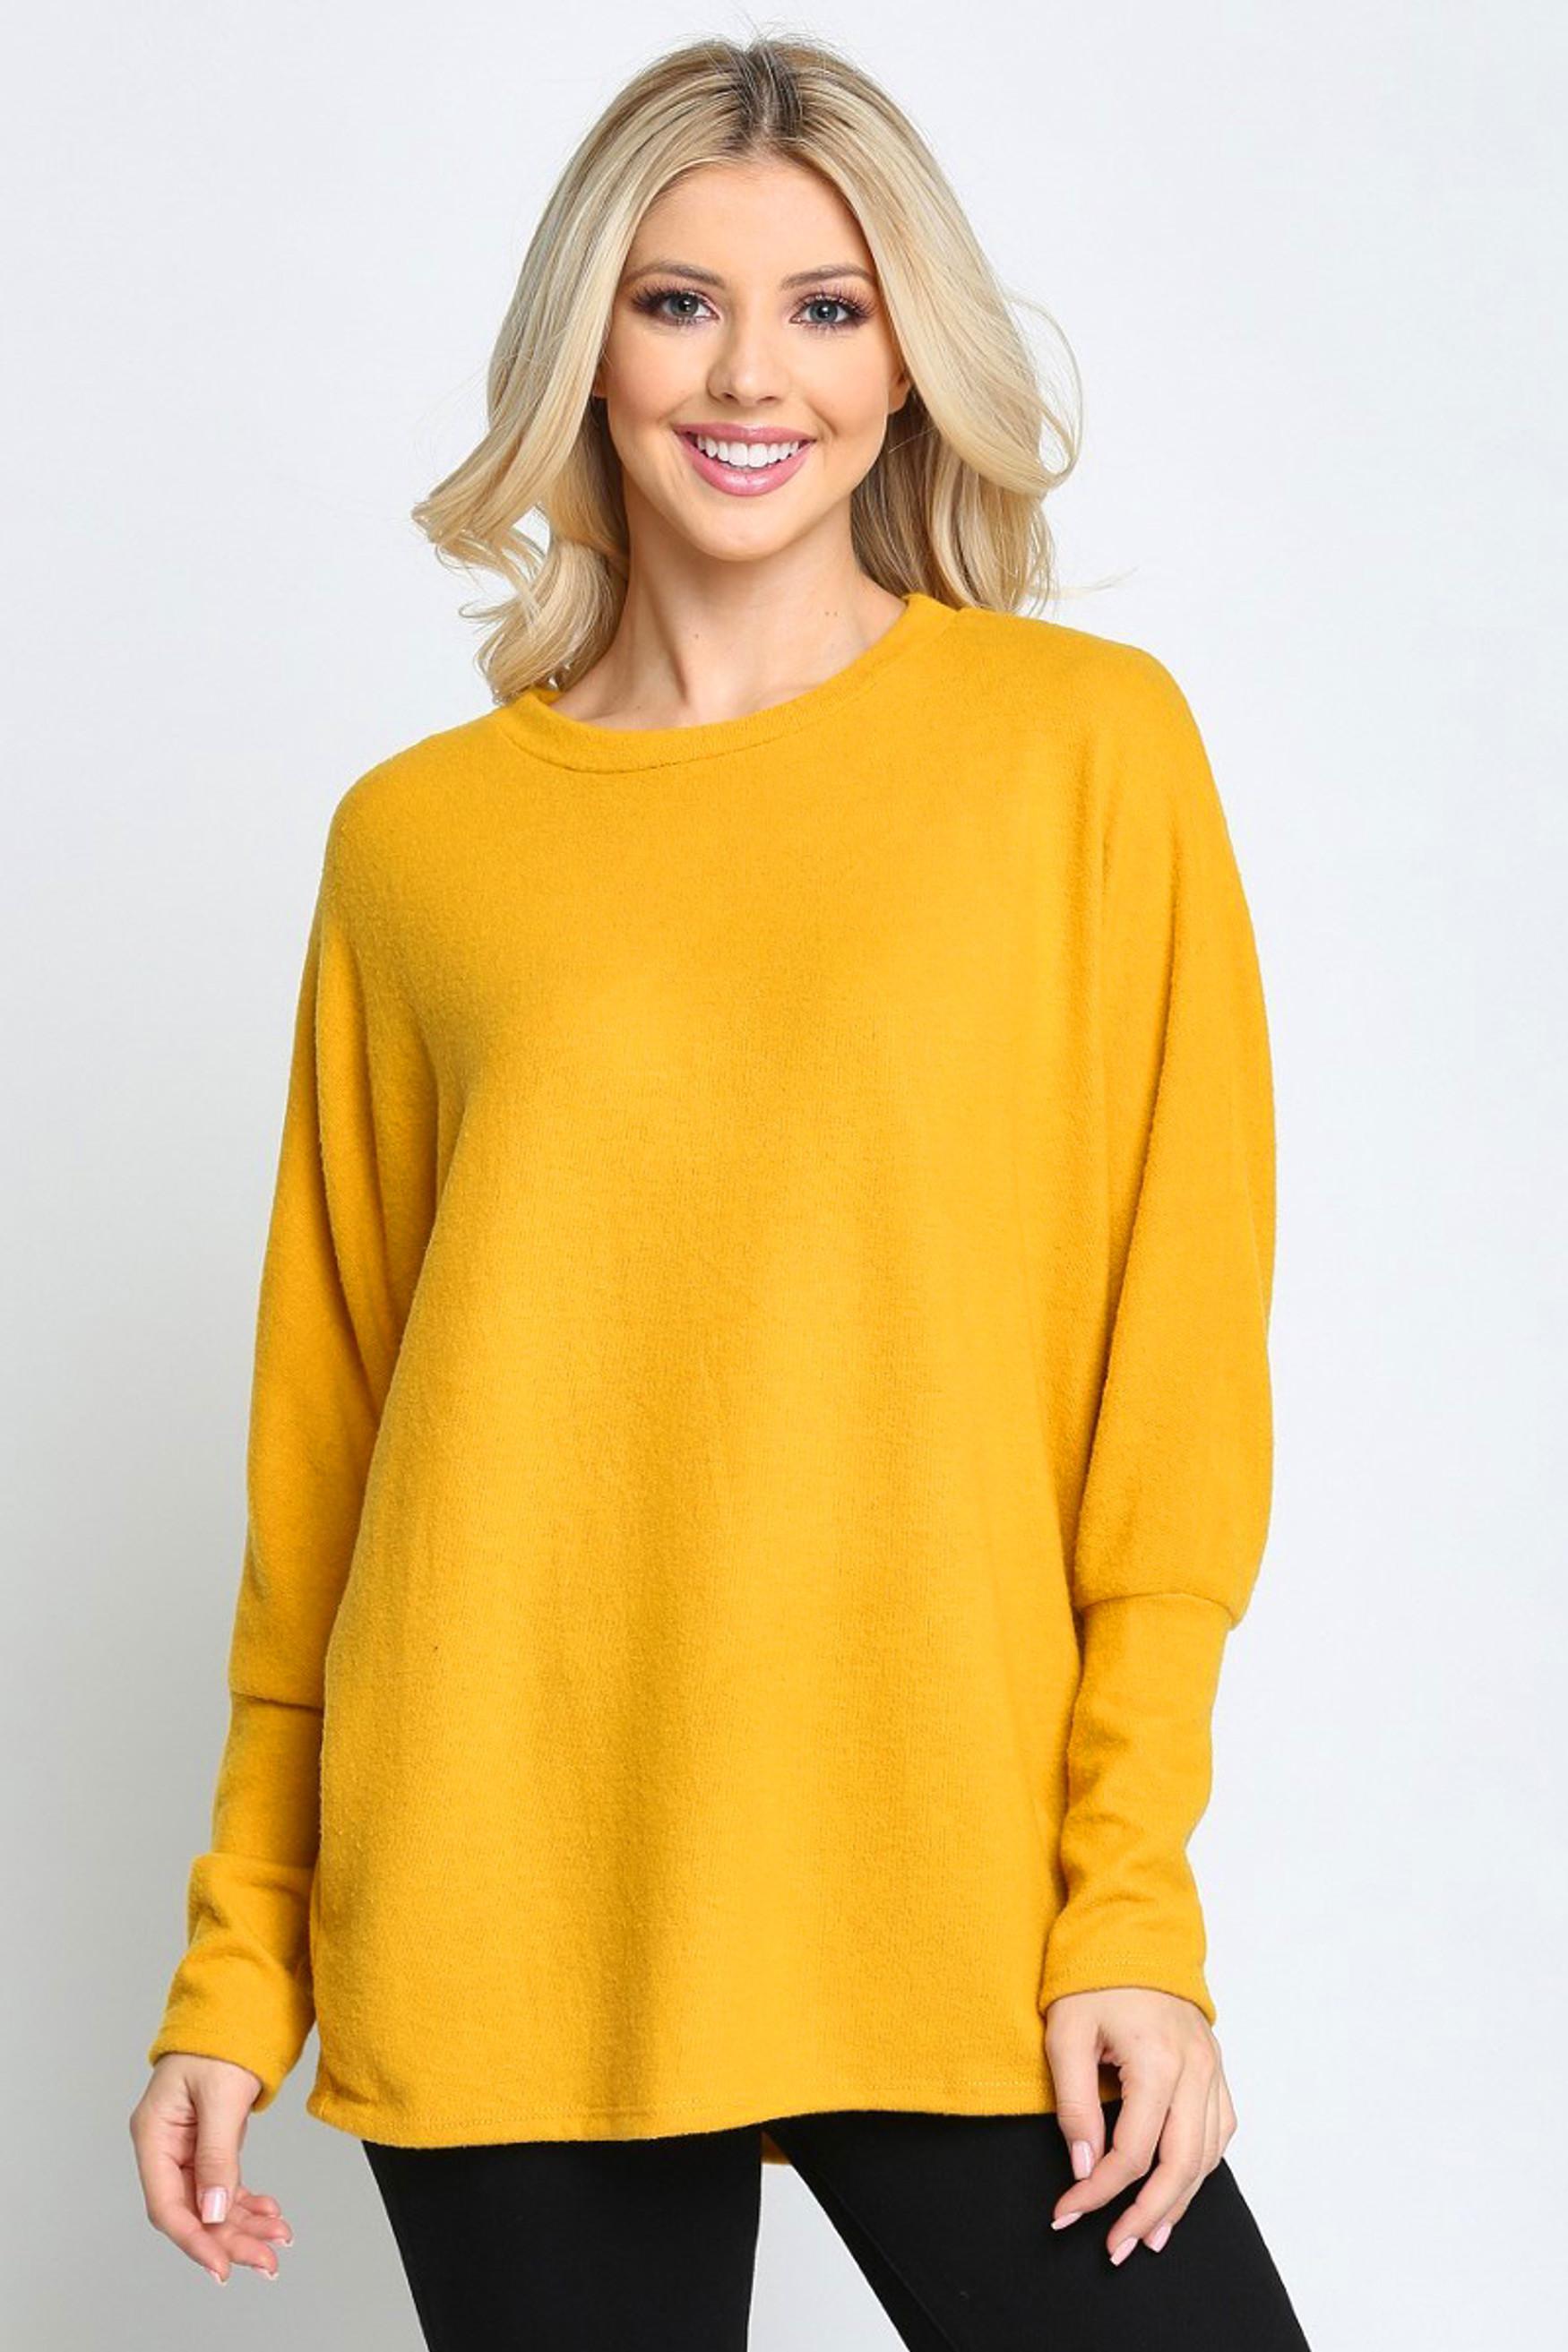 Mustard Solid Long Sleeve Dolman Plus Size Top